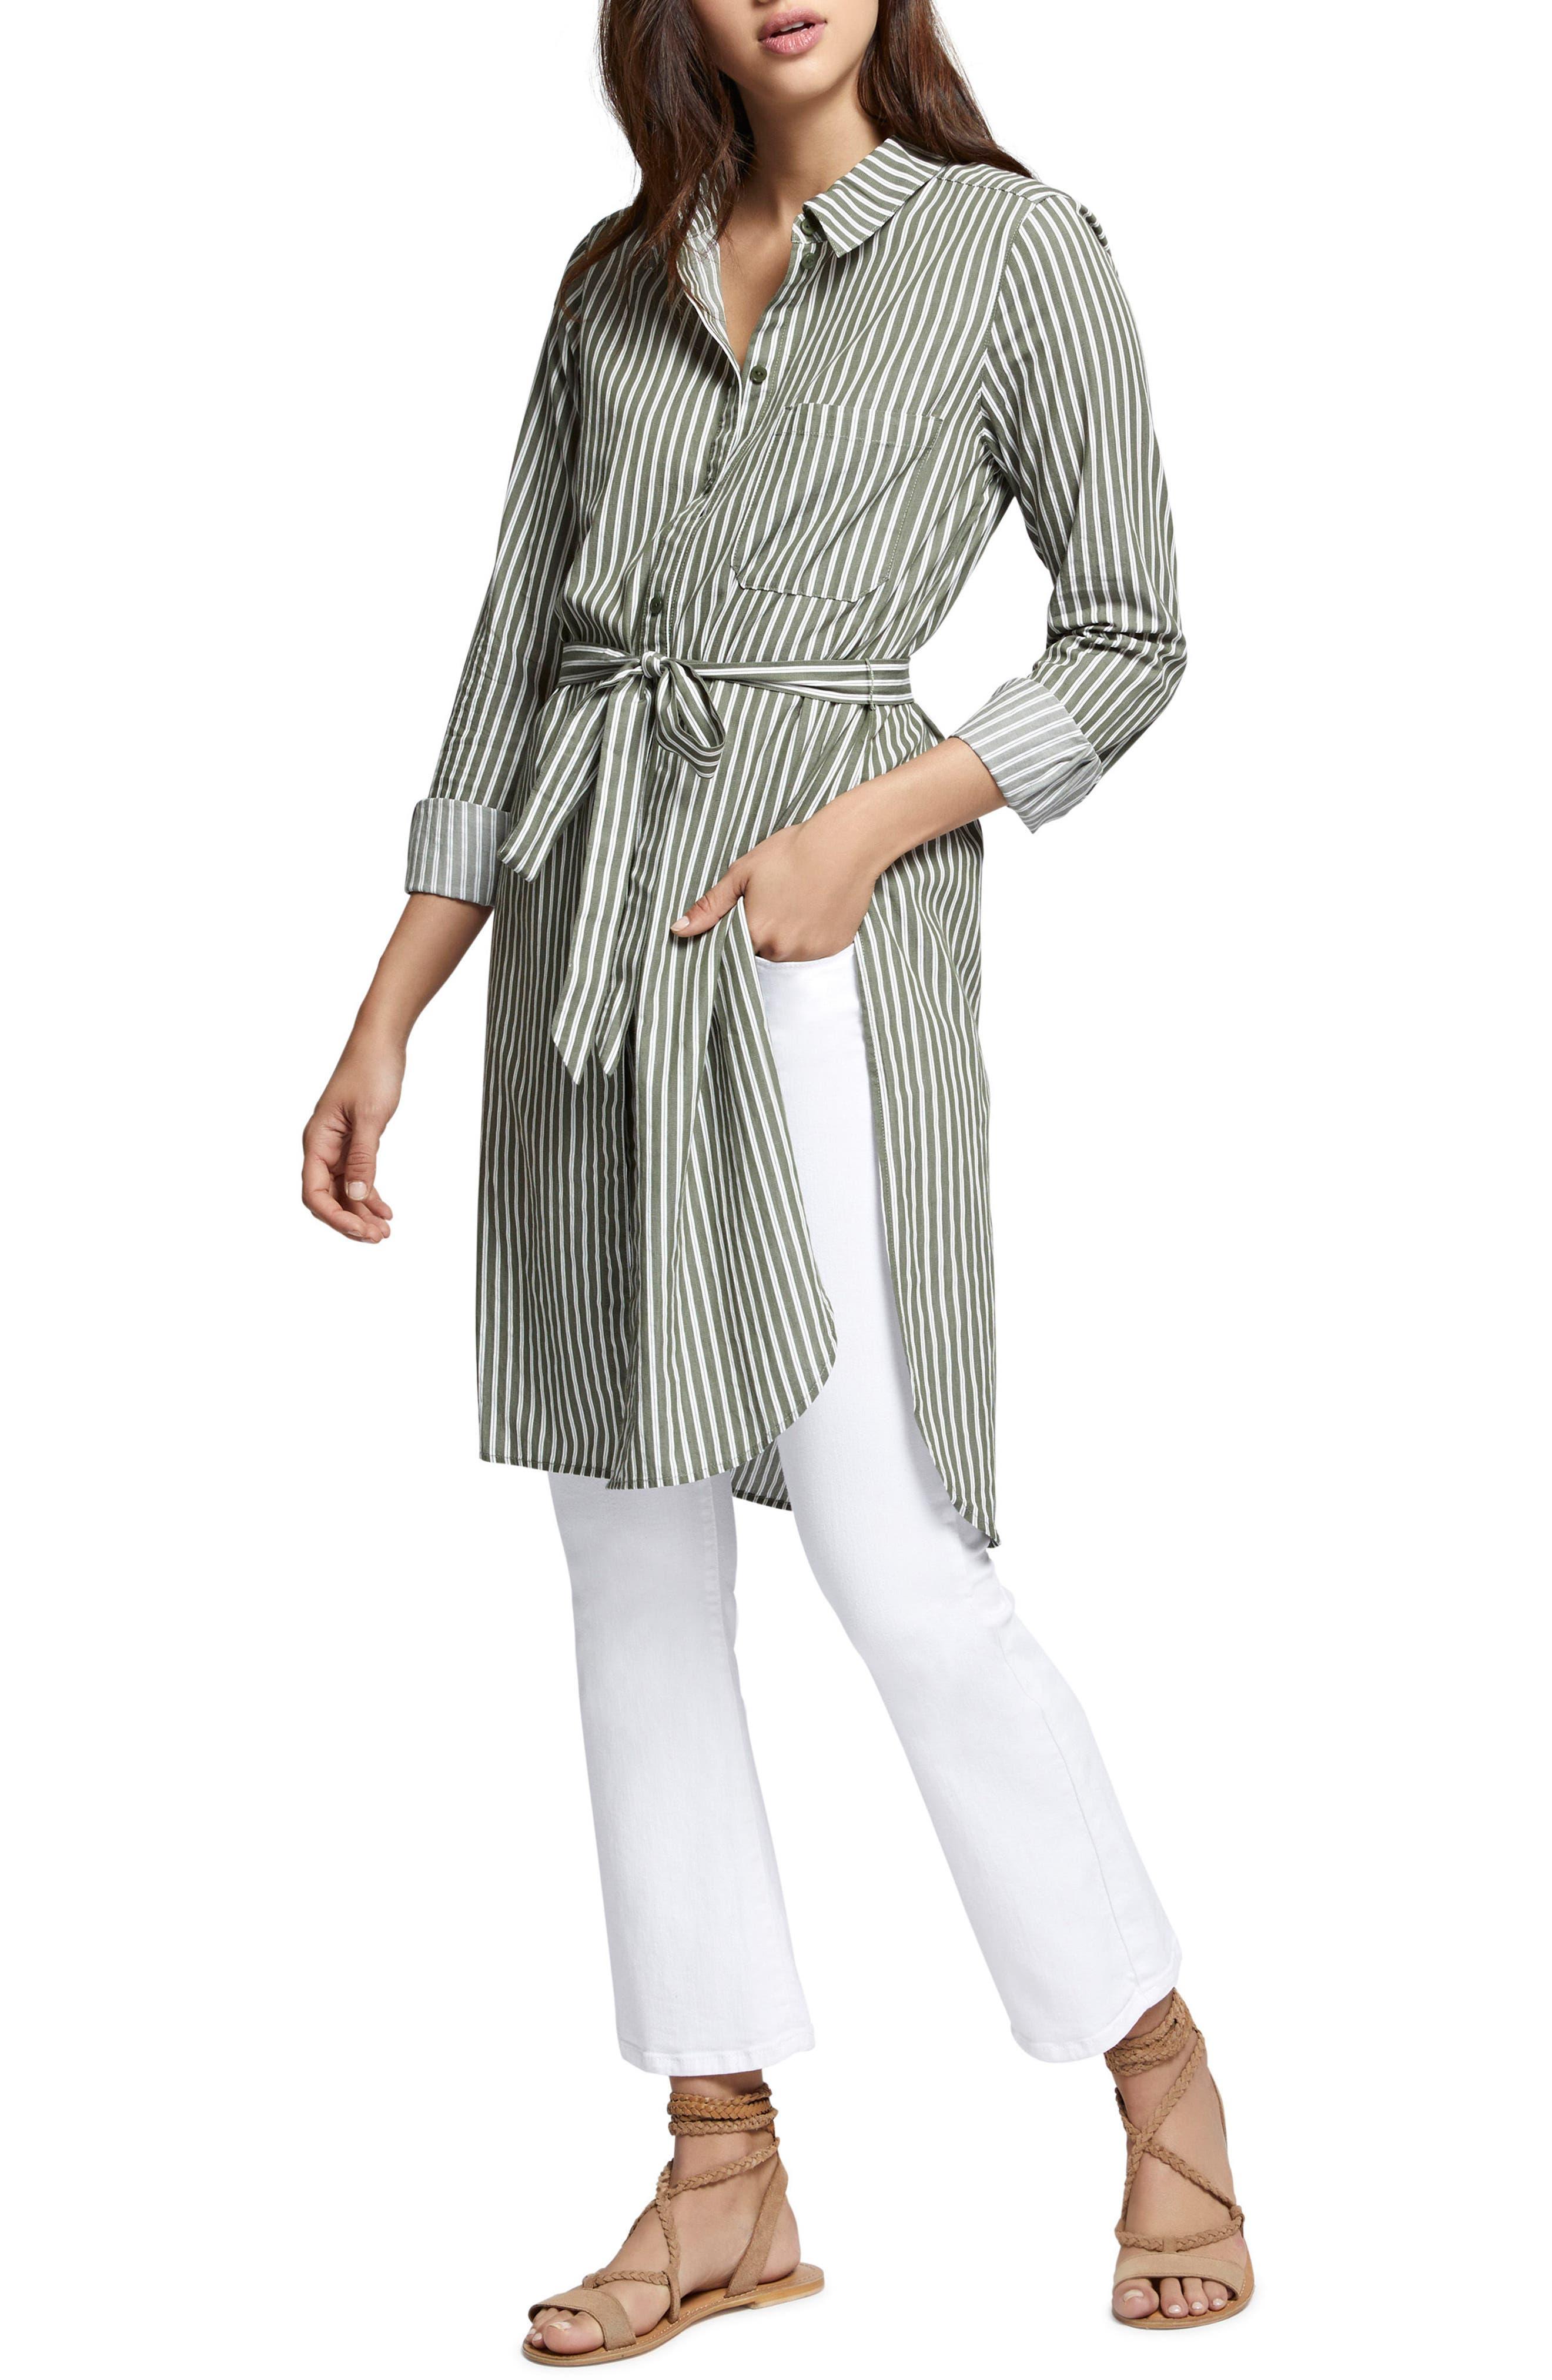 Teagan Maxi Shirt,                             Alternate thumbnail 4, color,                             Cadet Stripe